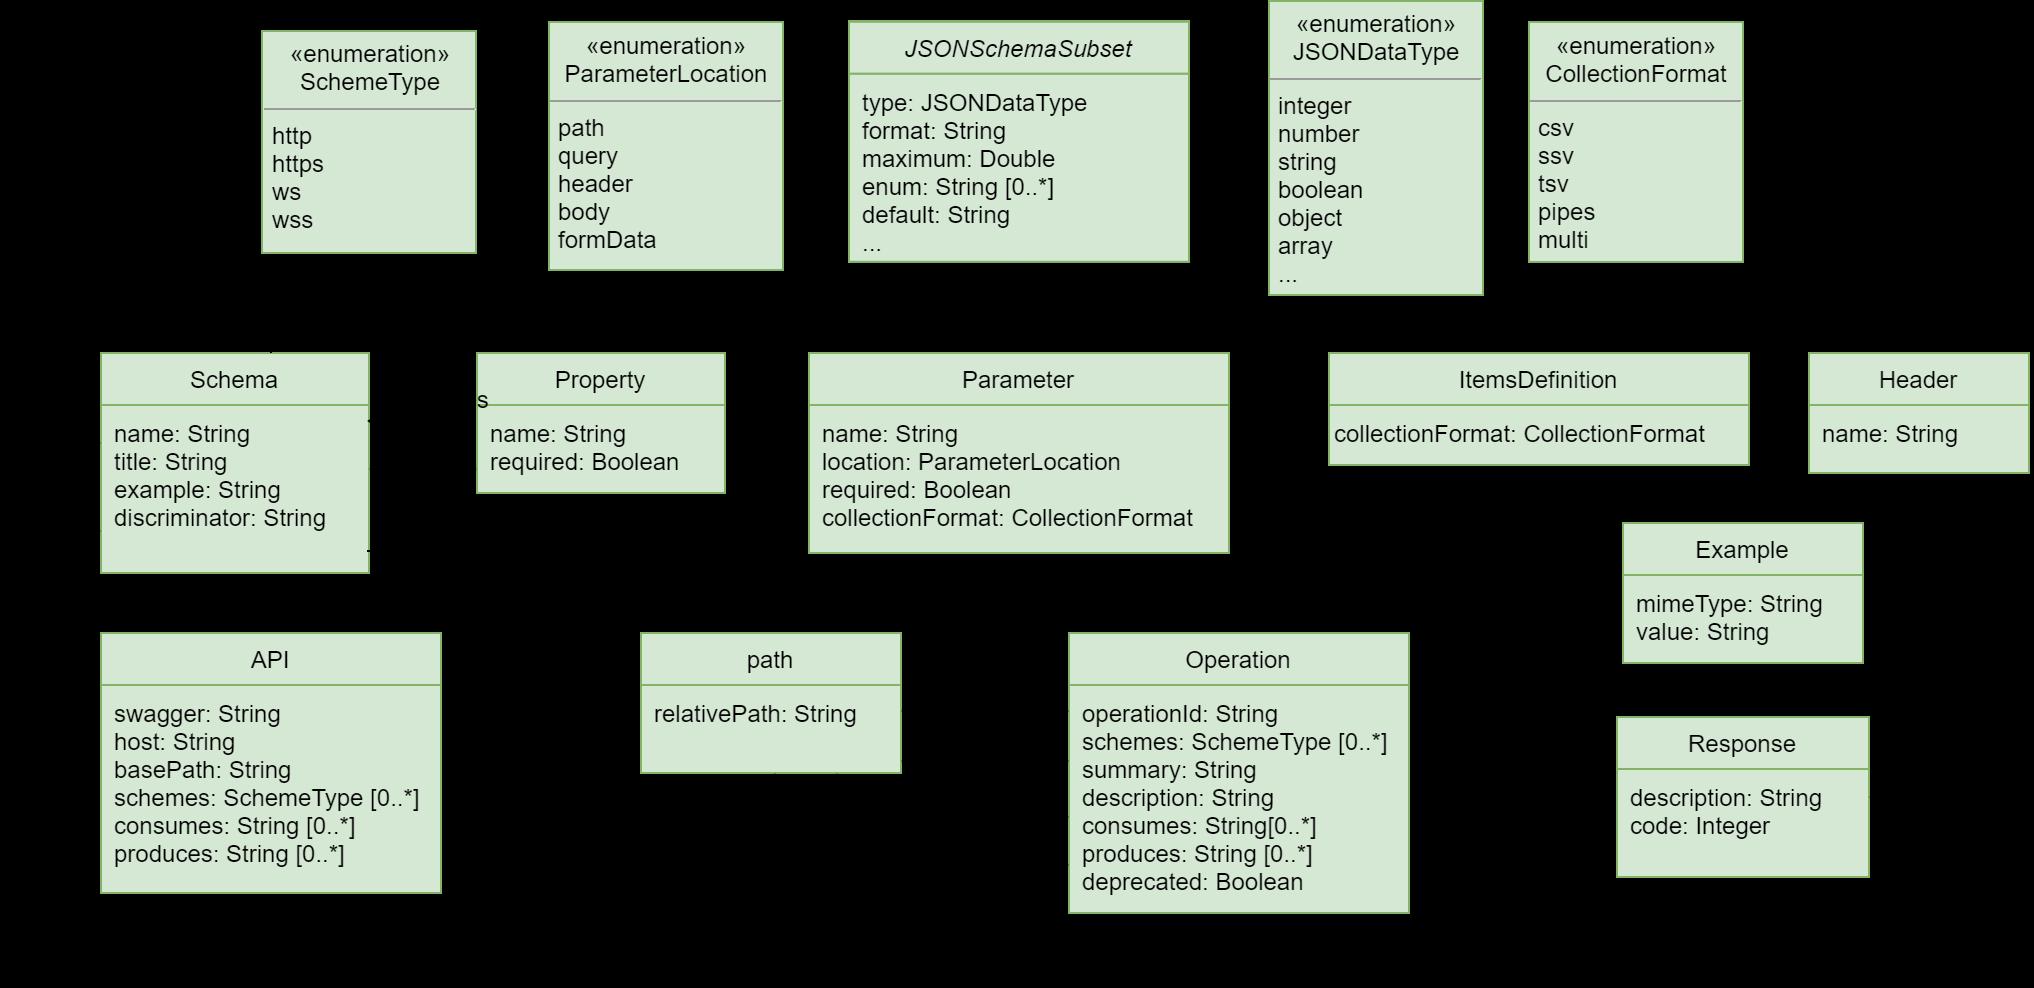 OpenAPI metamodel